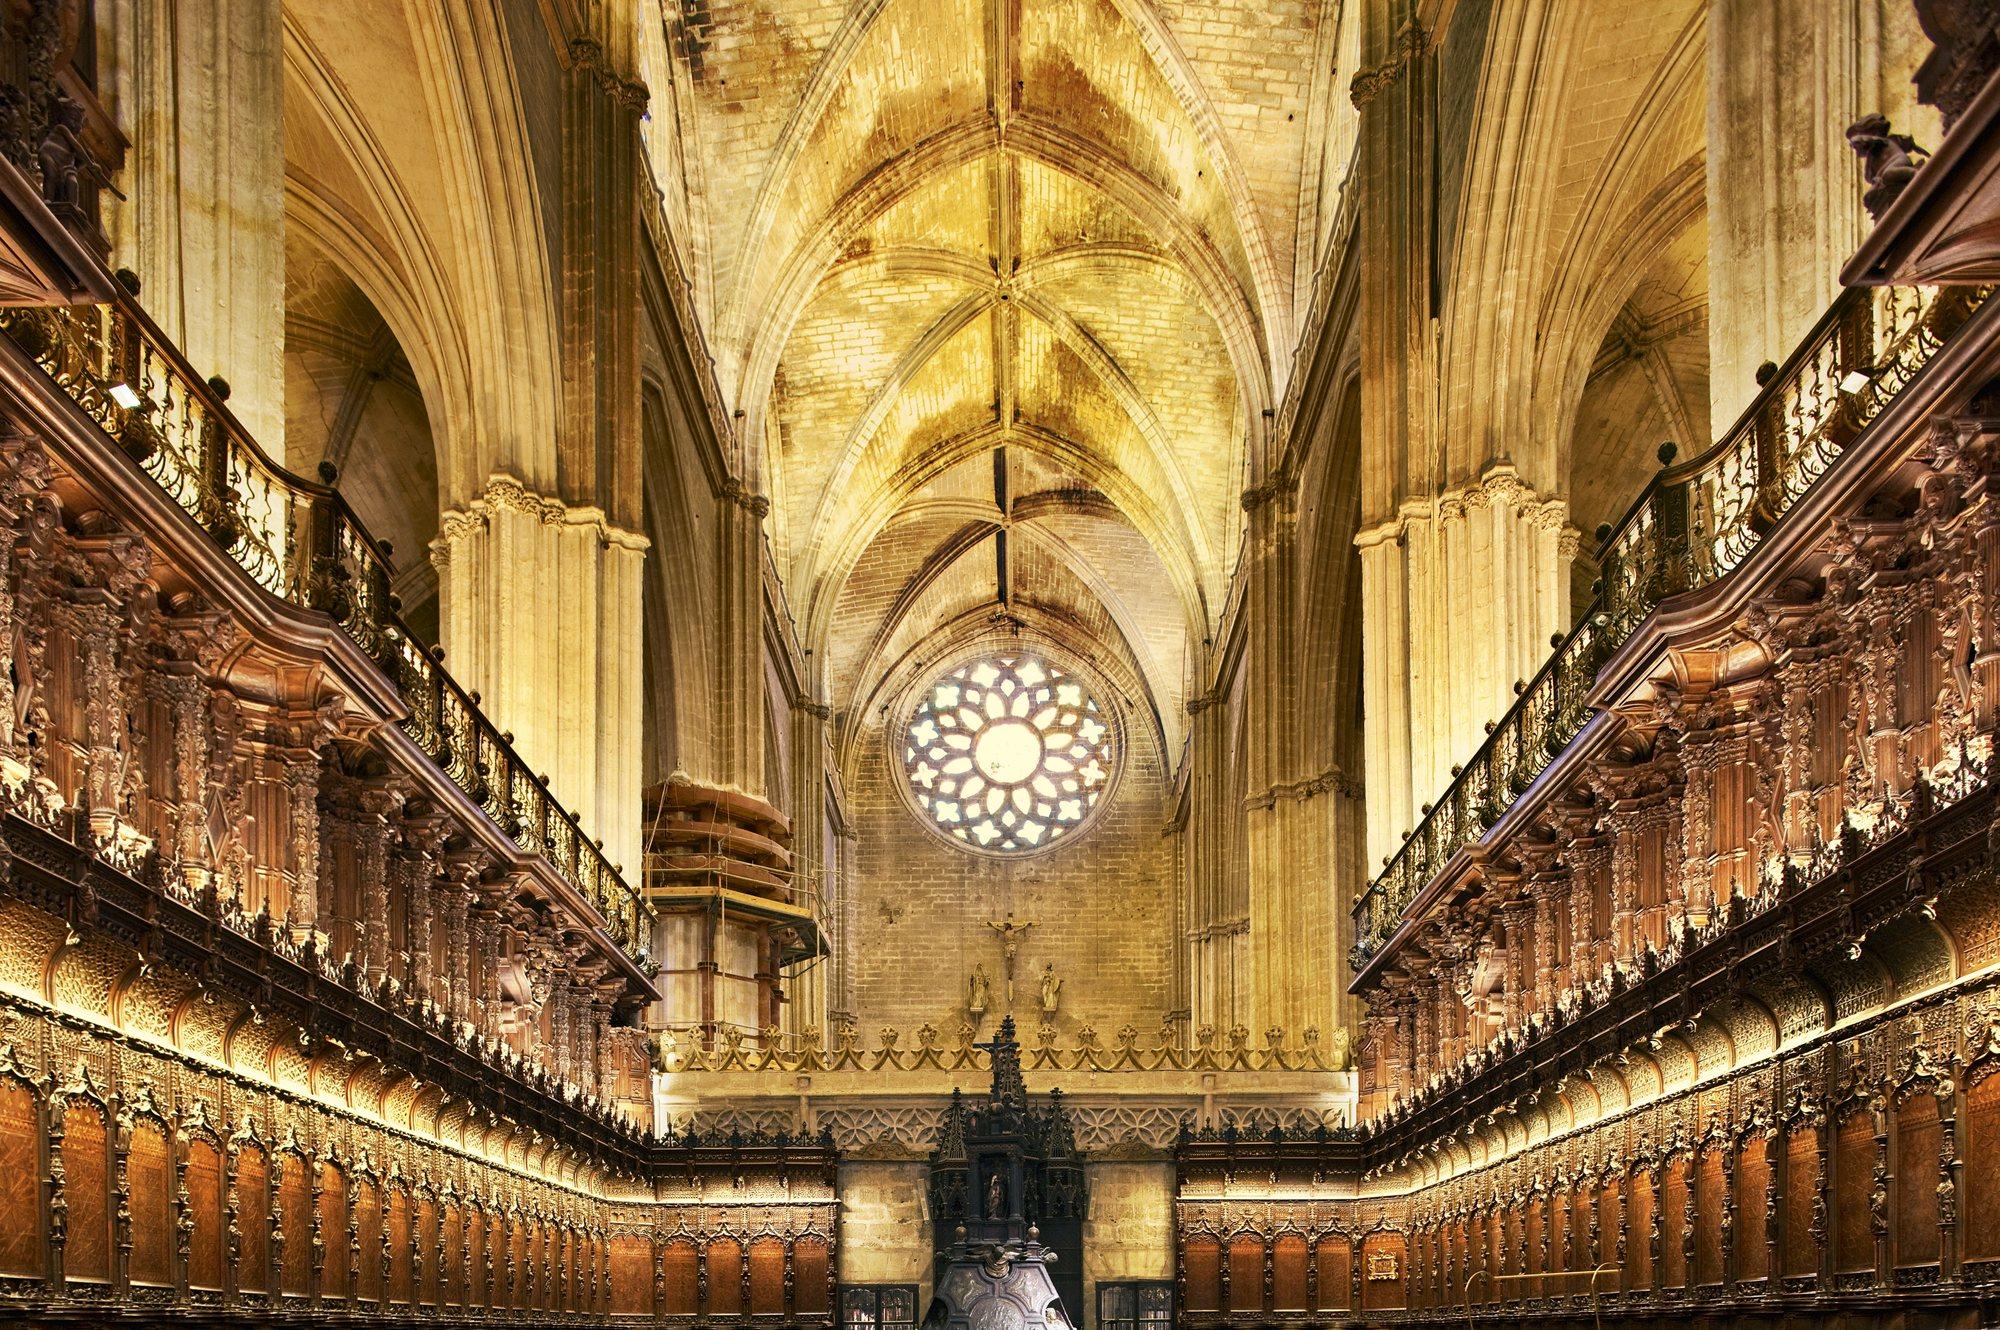 M gica sevilla maravilloso video que muestra esta joya for Exterior catedral de sevilla